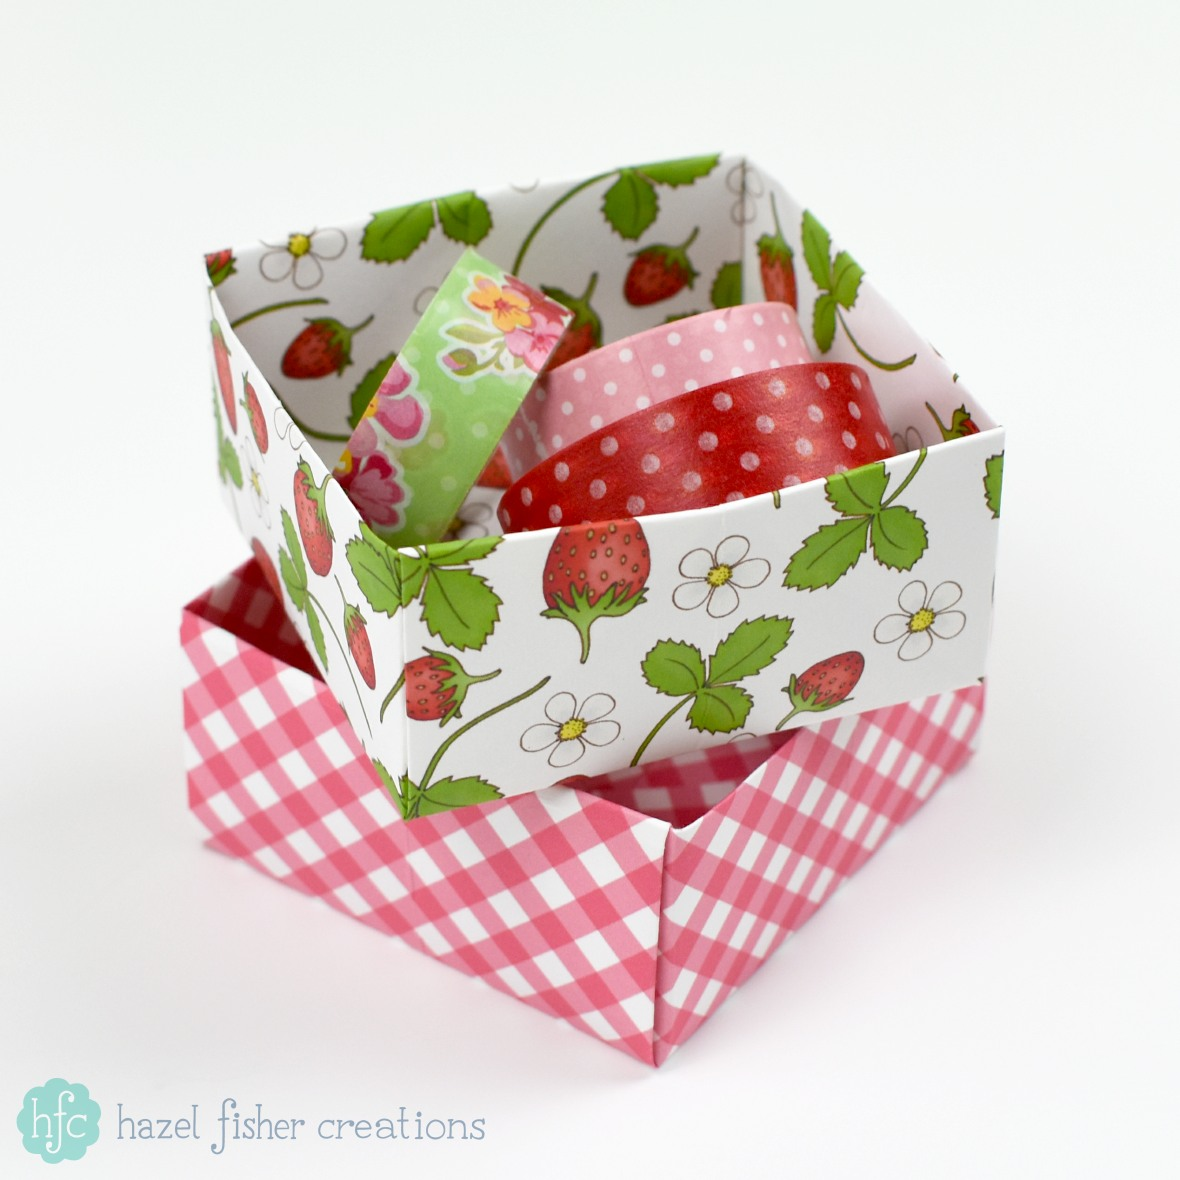 Hazel Fisher Creations: Origami Box Tutorial - photo#20